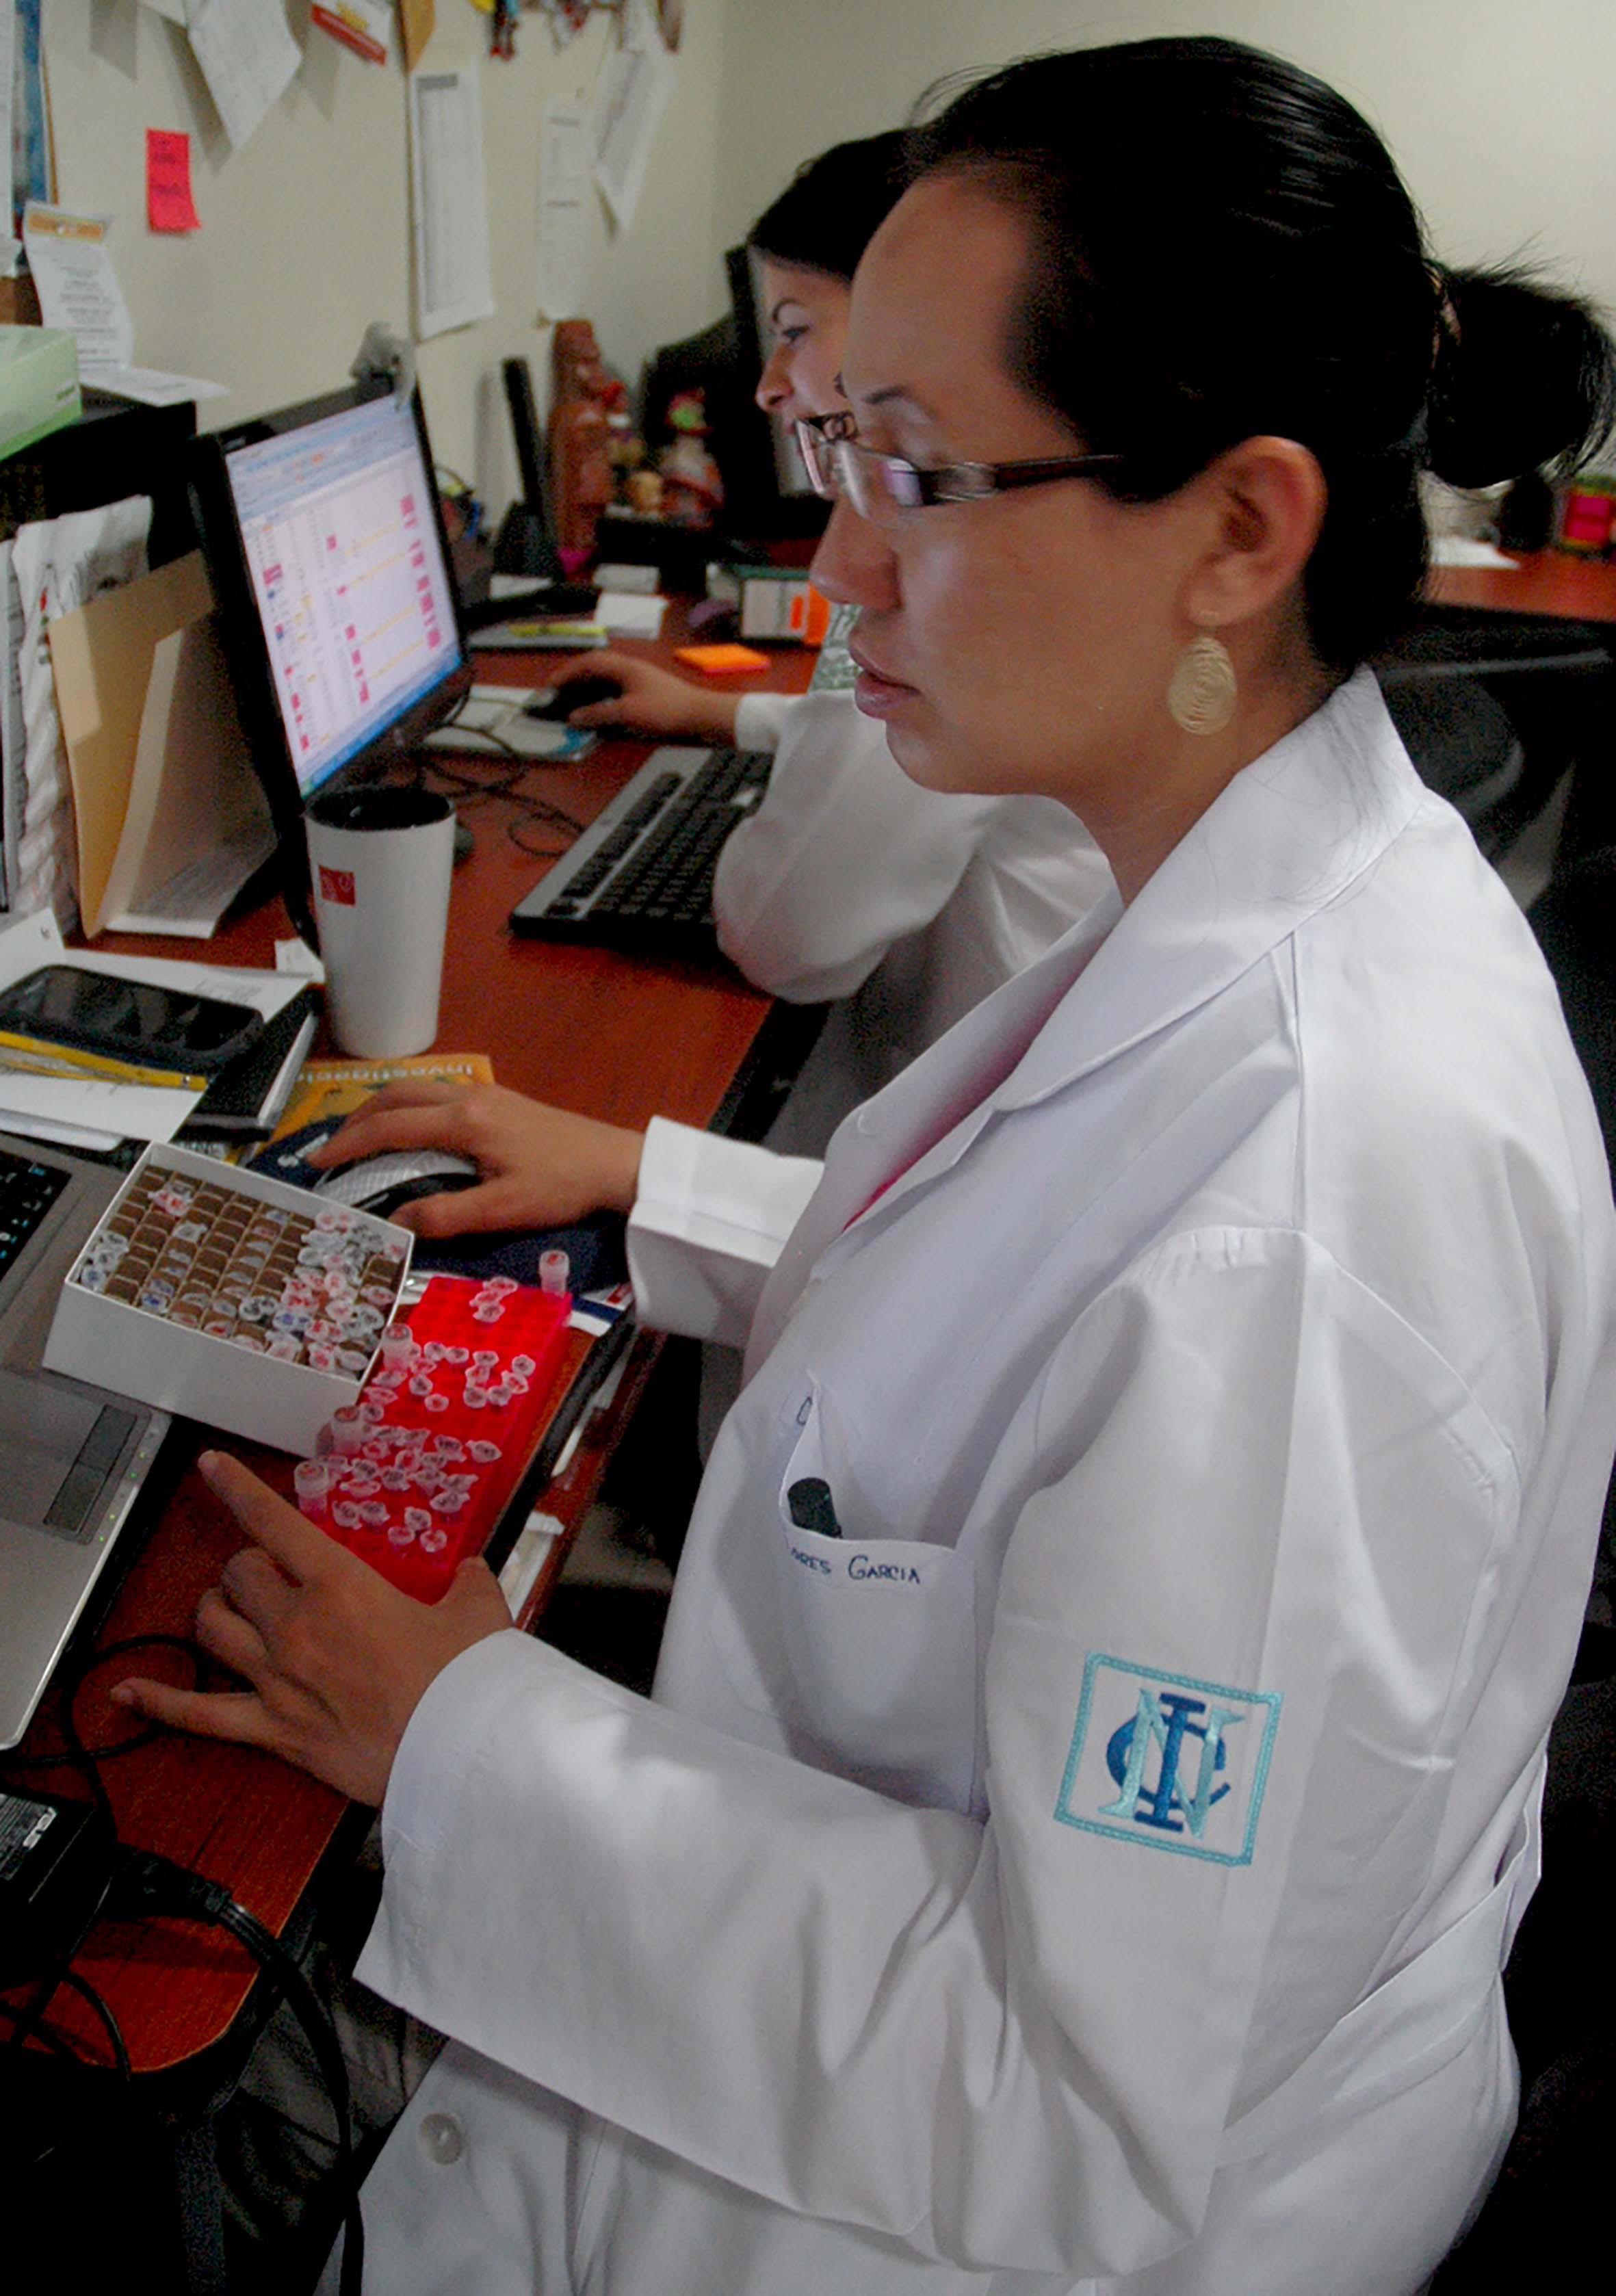 070715 Cardiolog a  Laboratorios 03.jpg